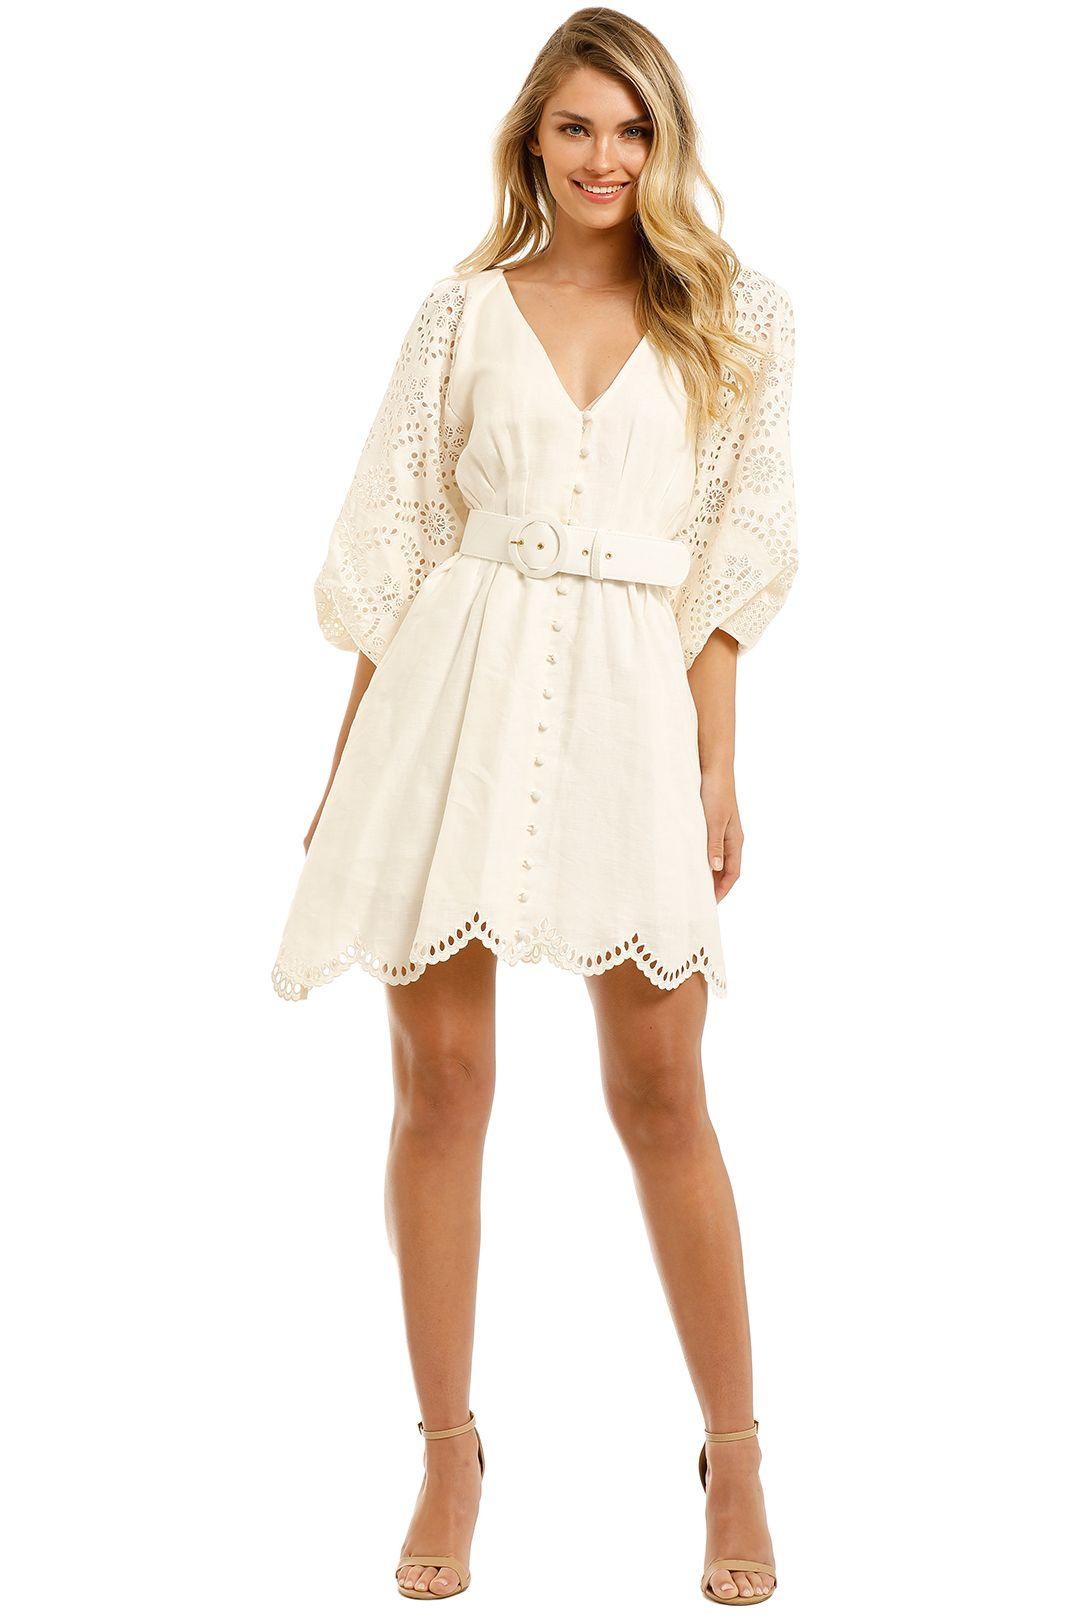 Nicholas-Louise-Dress-Ivory-Front